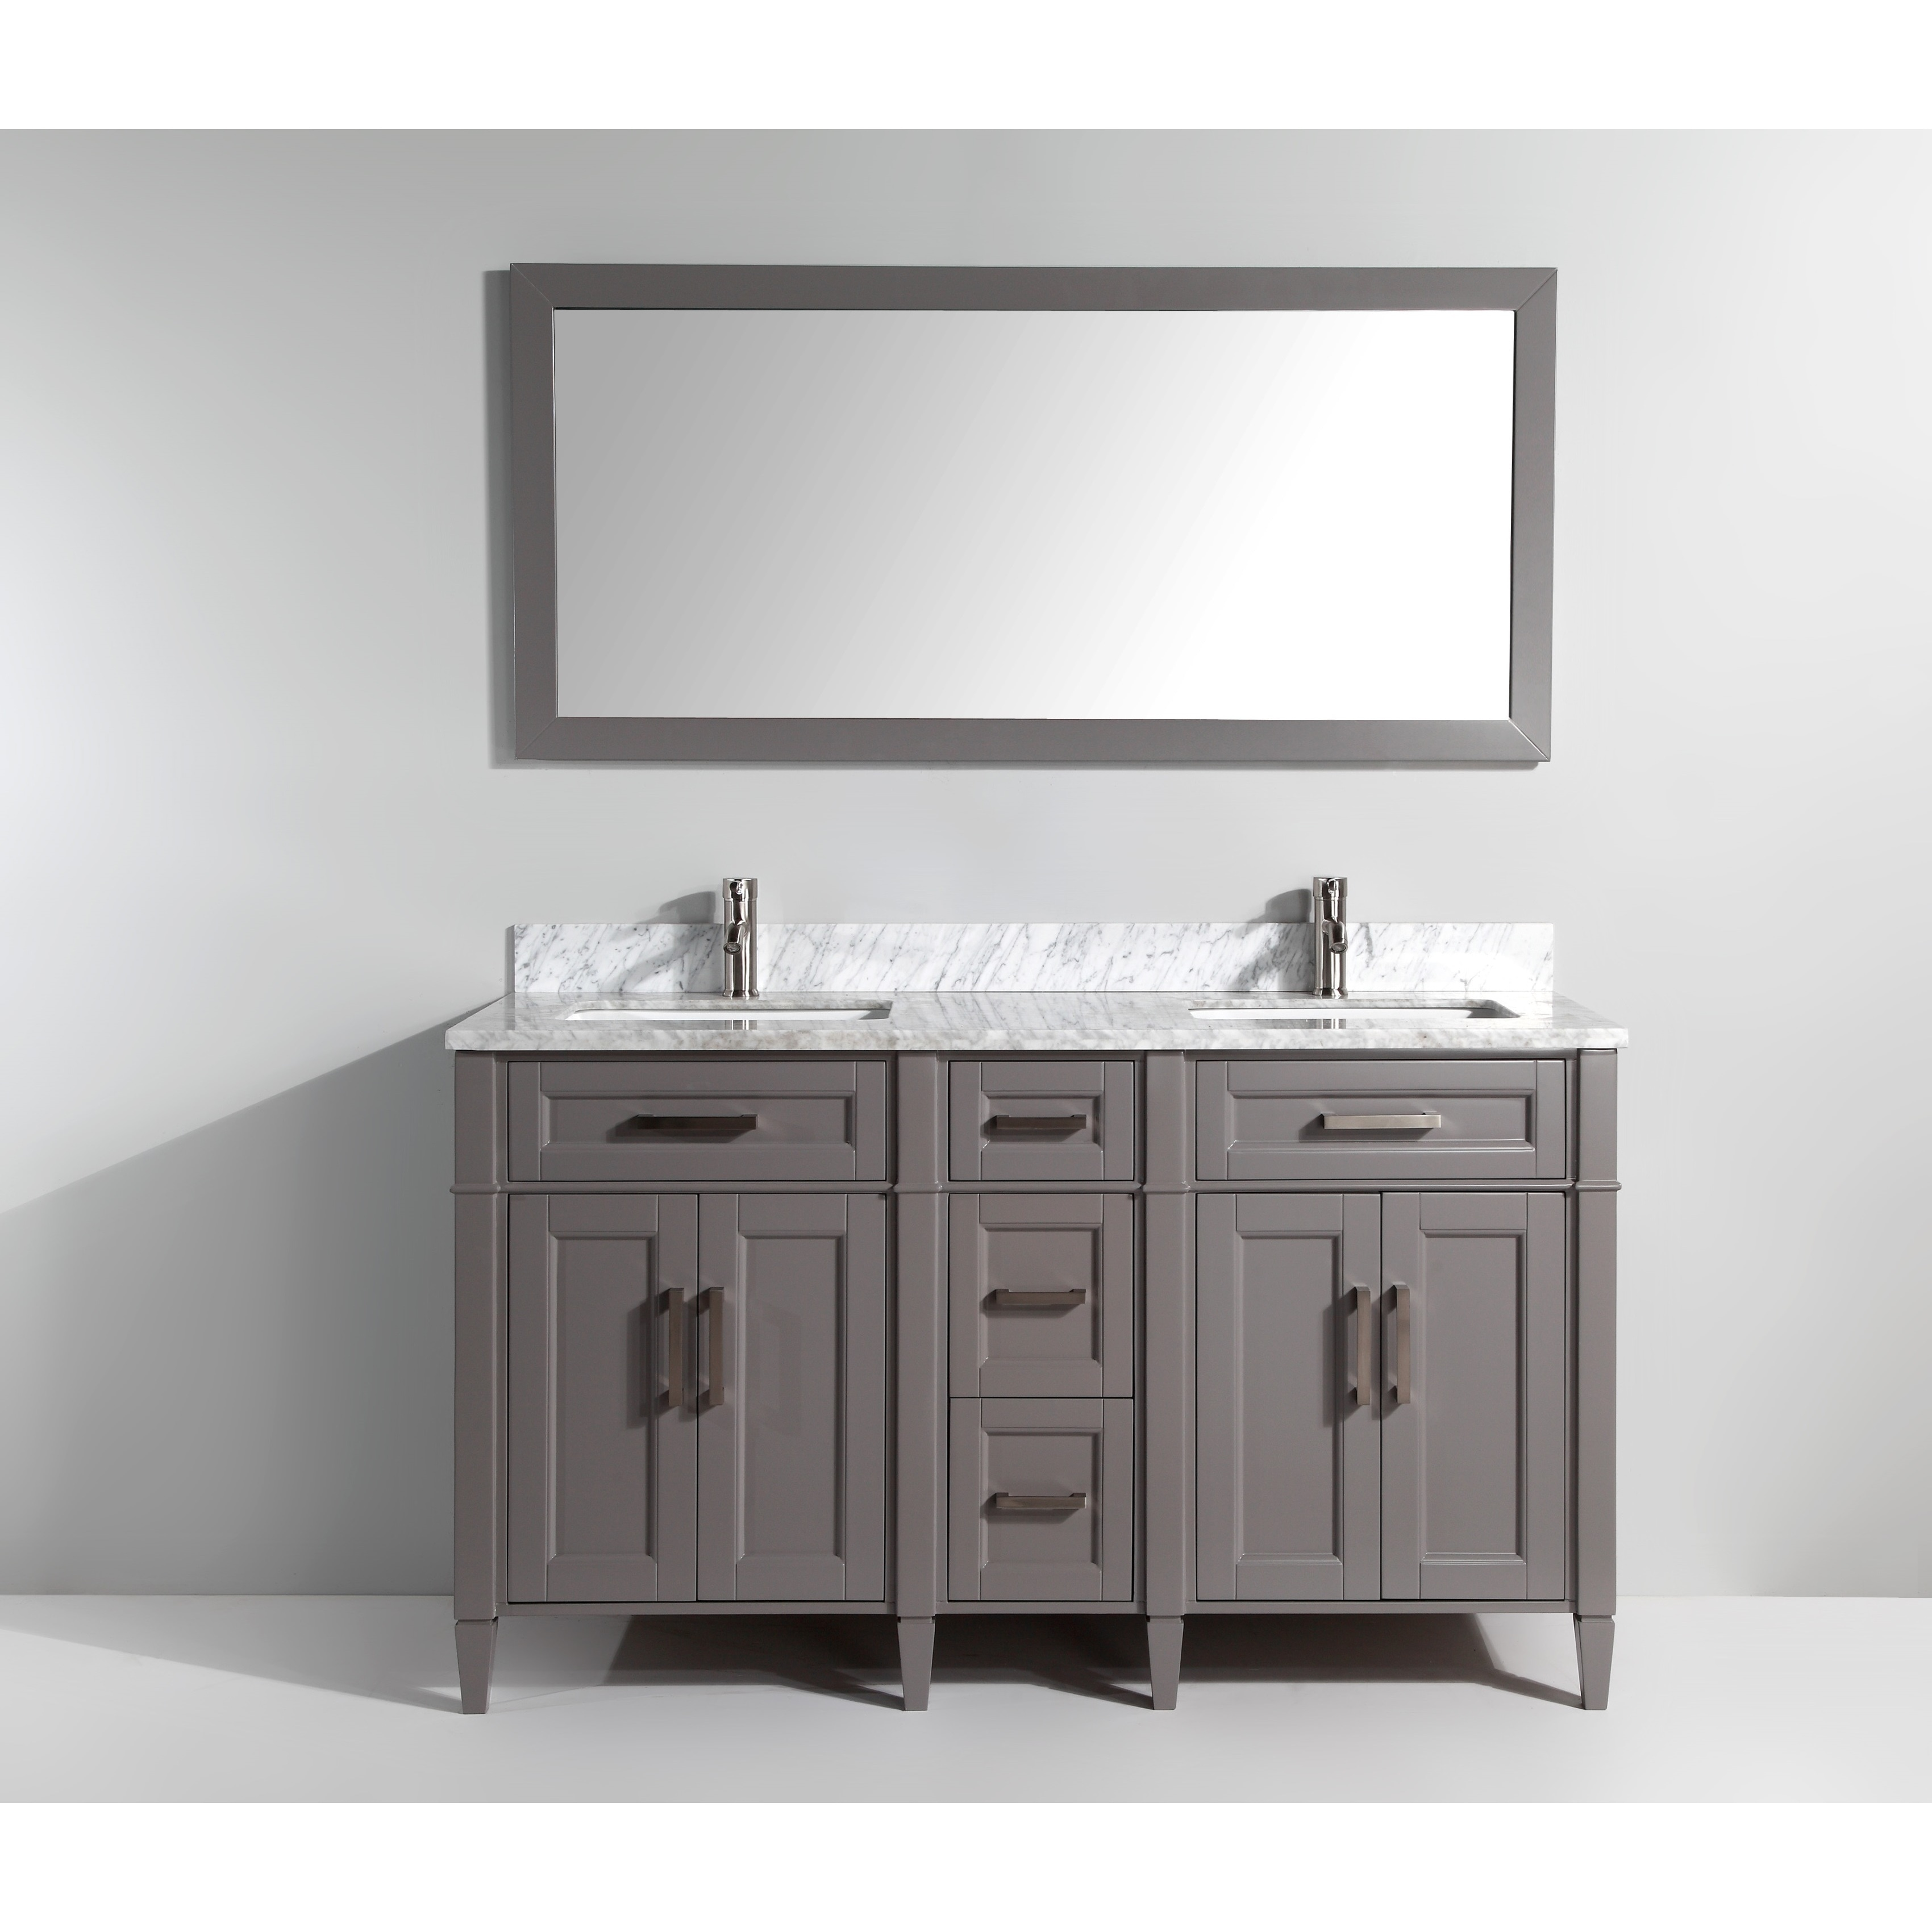 Vanity art inch double sink bathroom vanity set with carrara